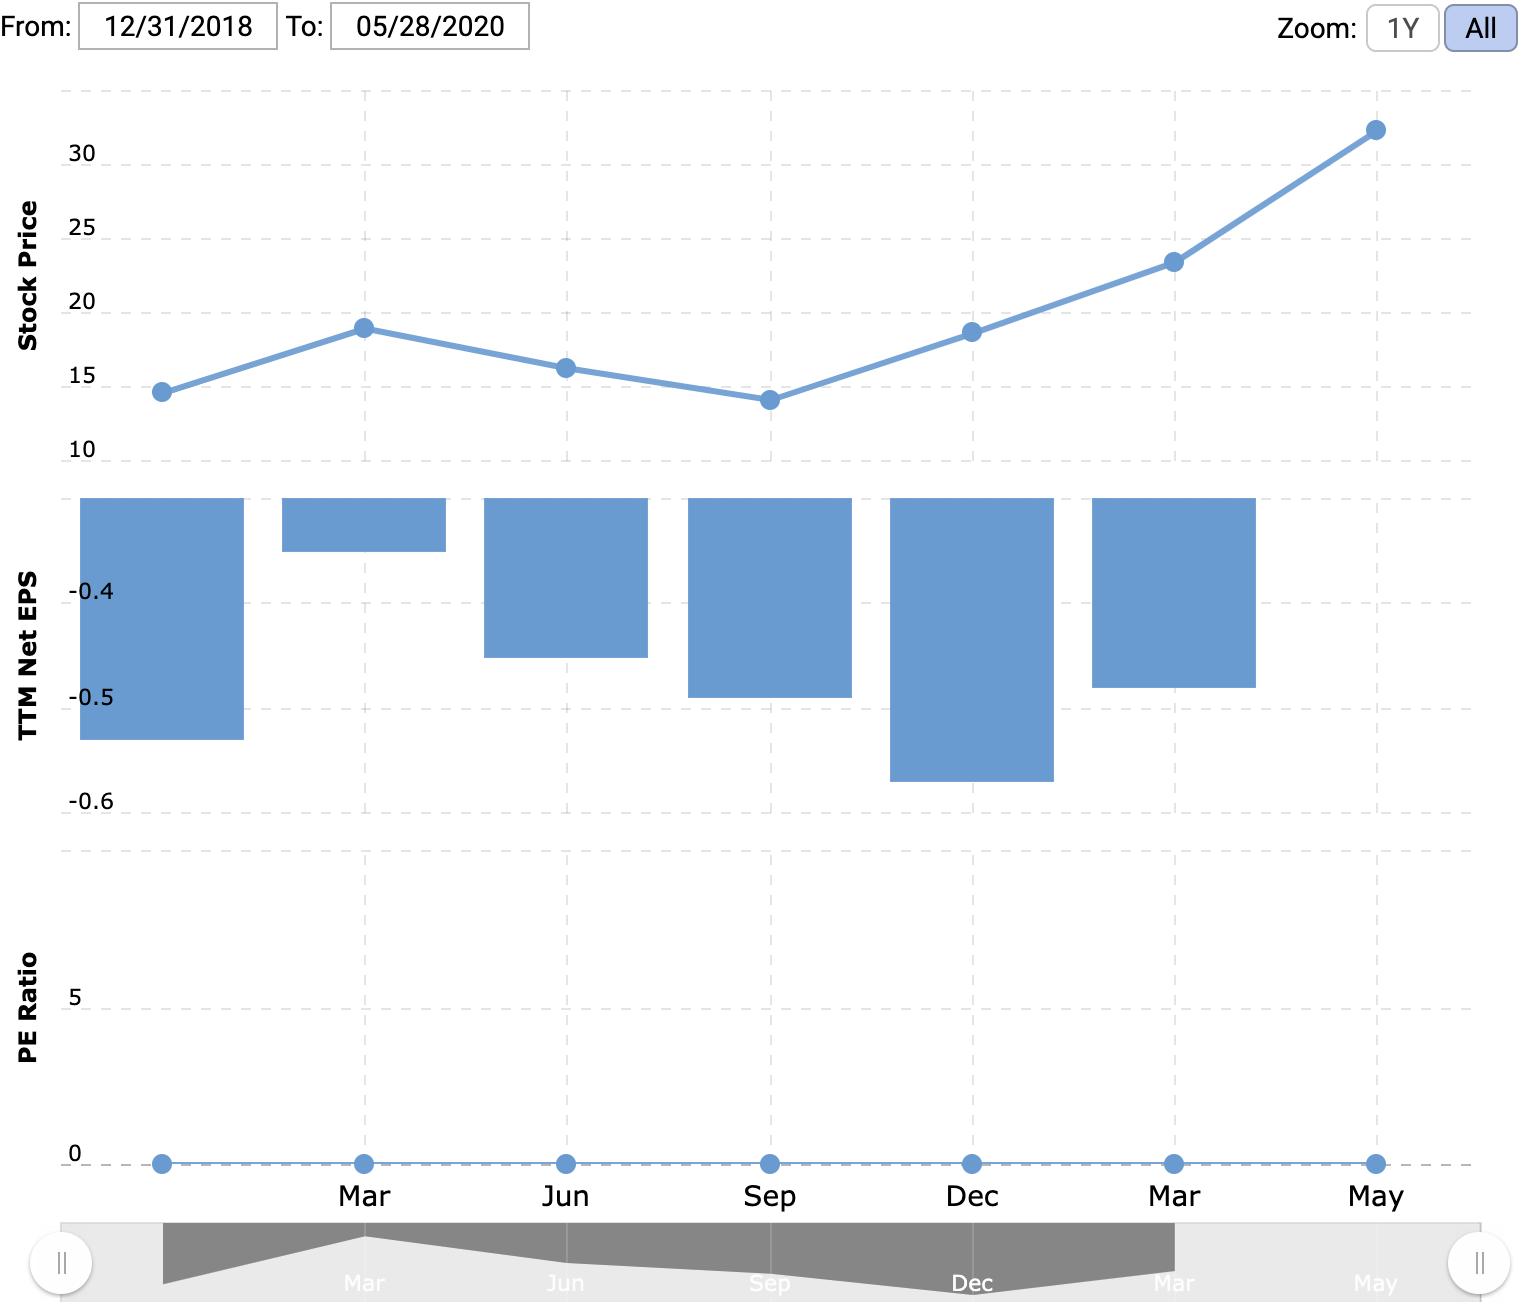 Цена акции, прибыль на акцию, P / E. Источник: Macrotrends